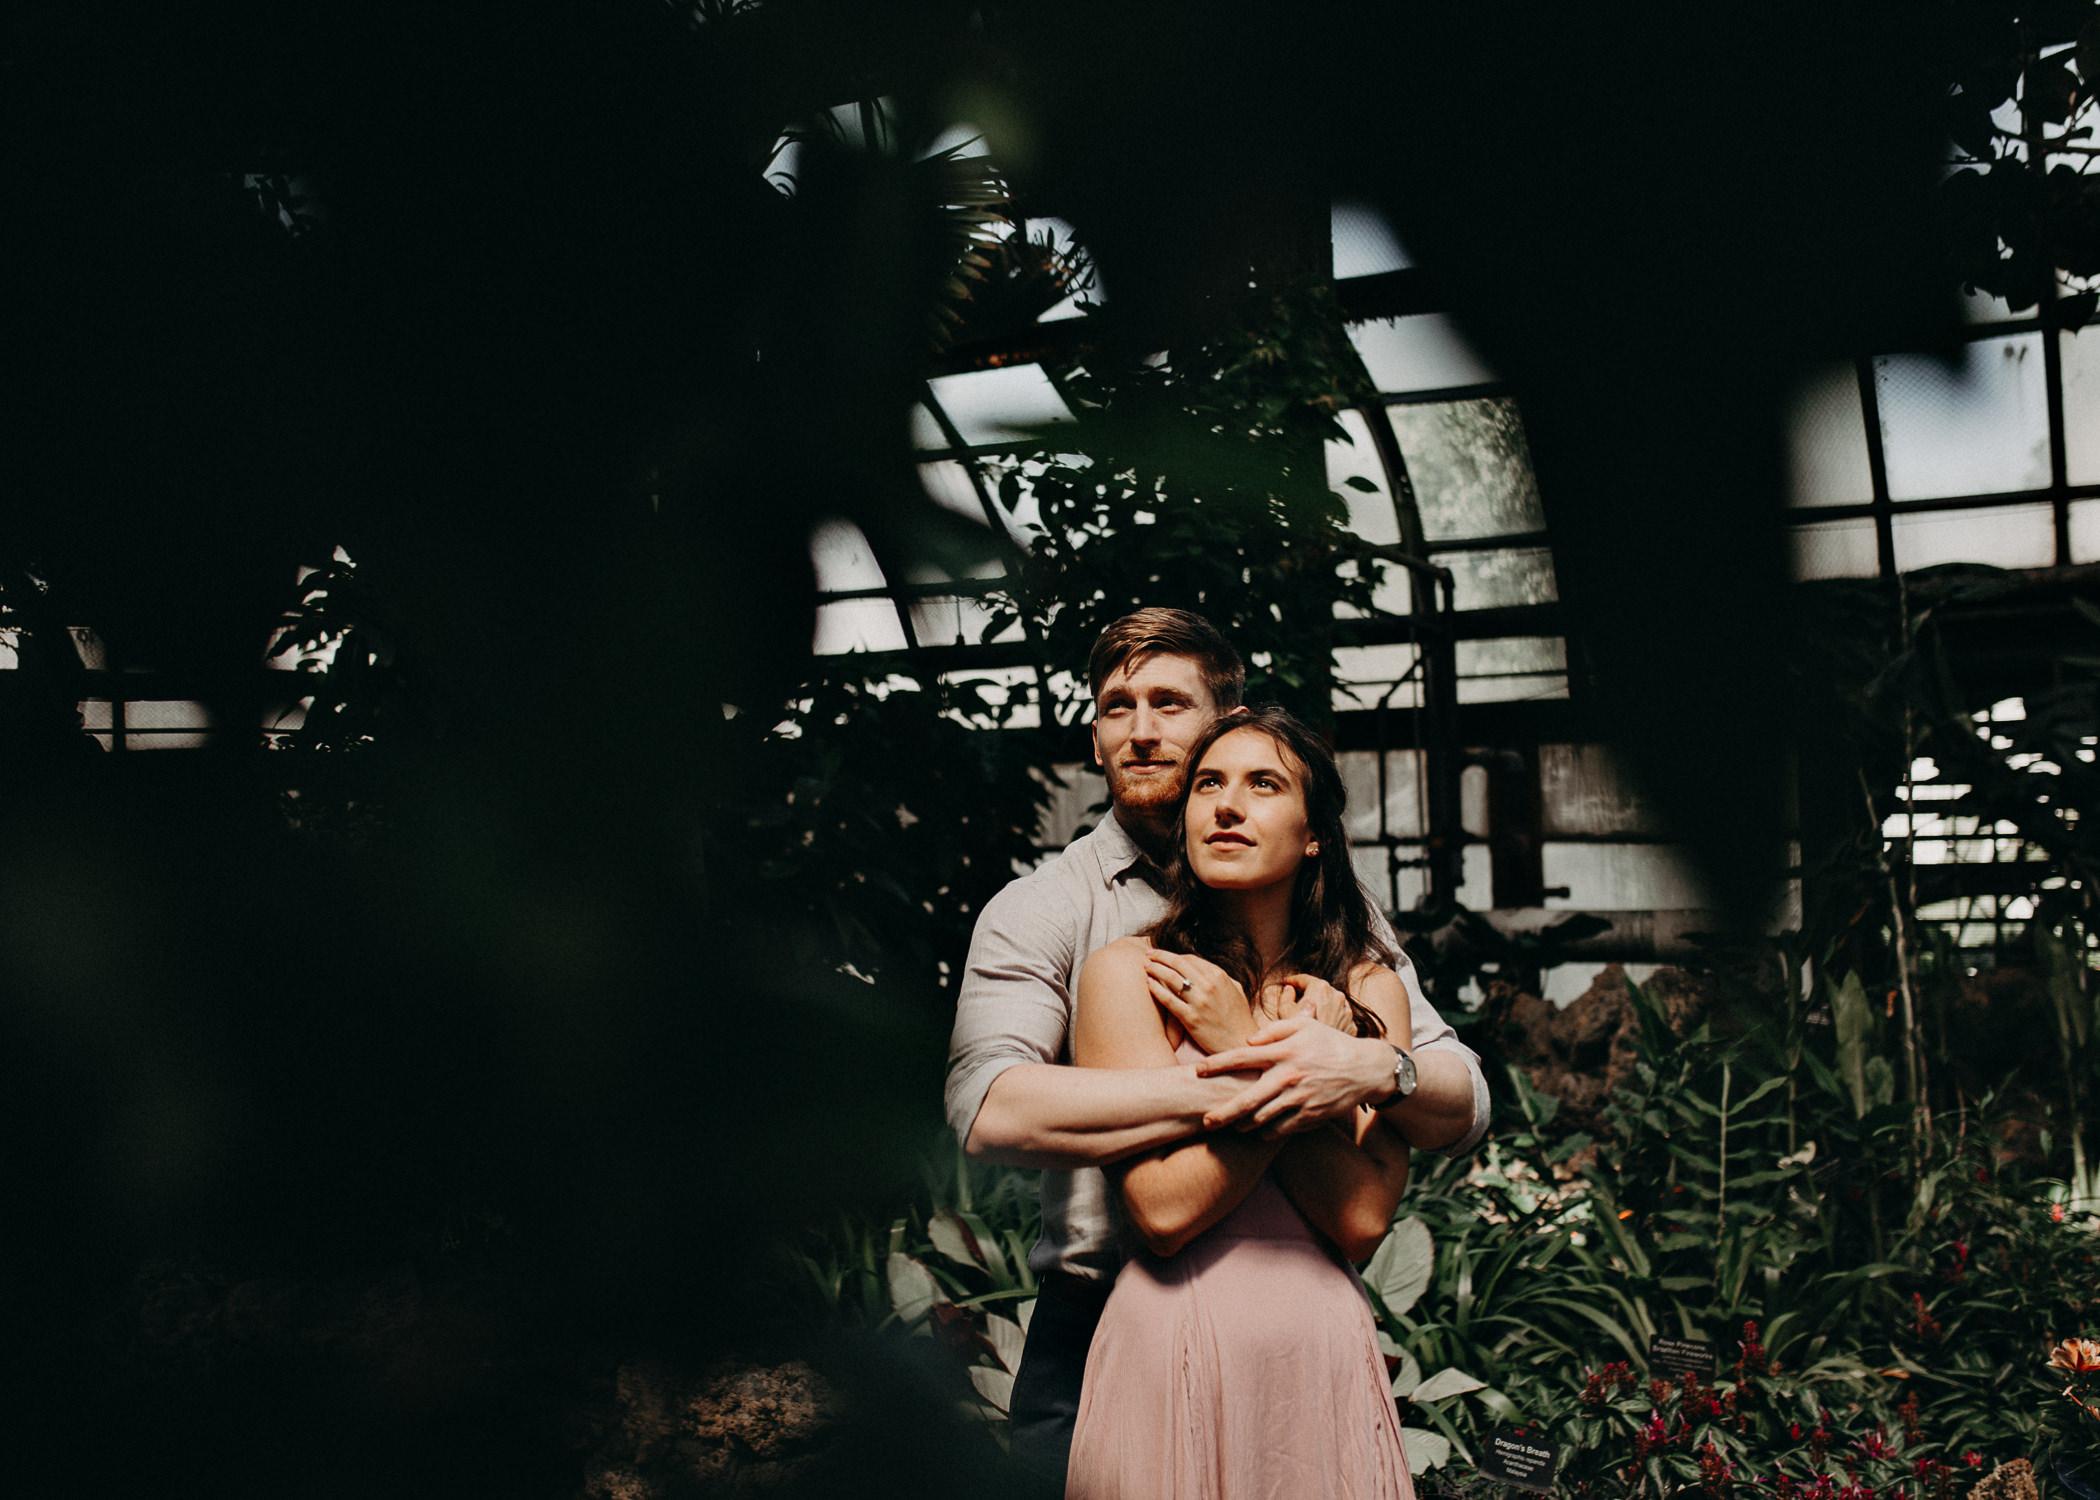 6- Chicago engagement wedding photographer - Aline Marin Photography.jpg